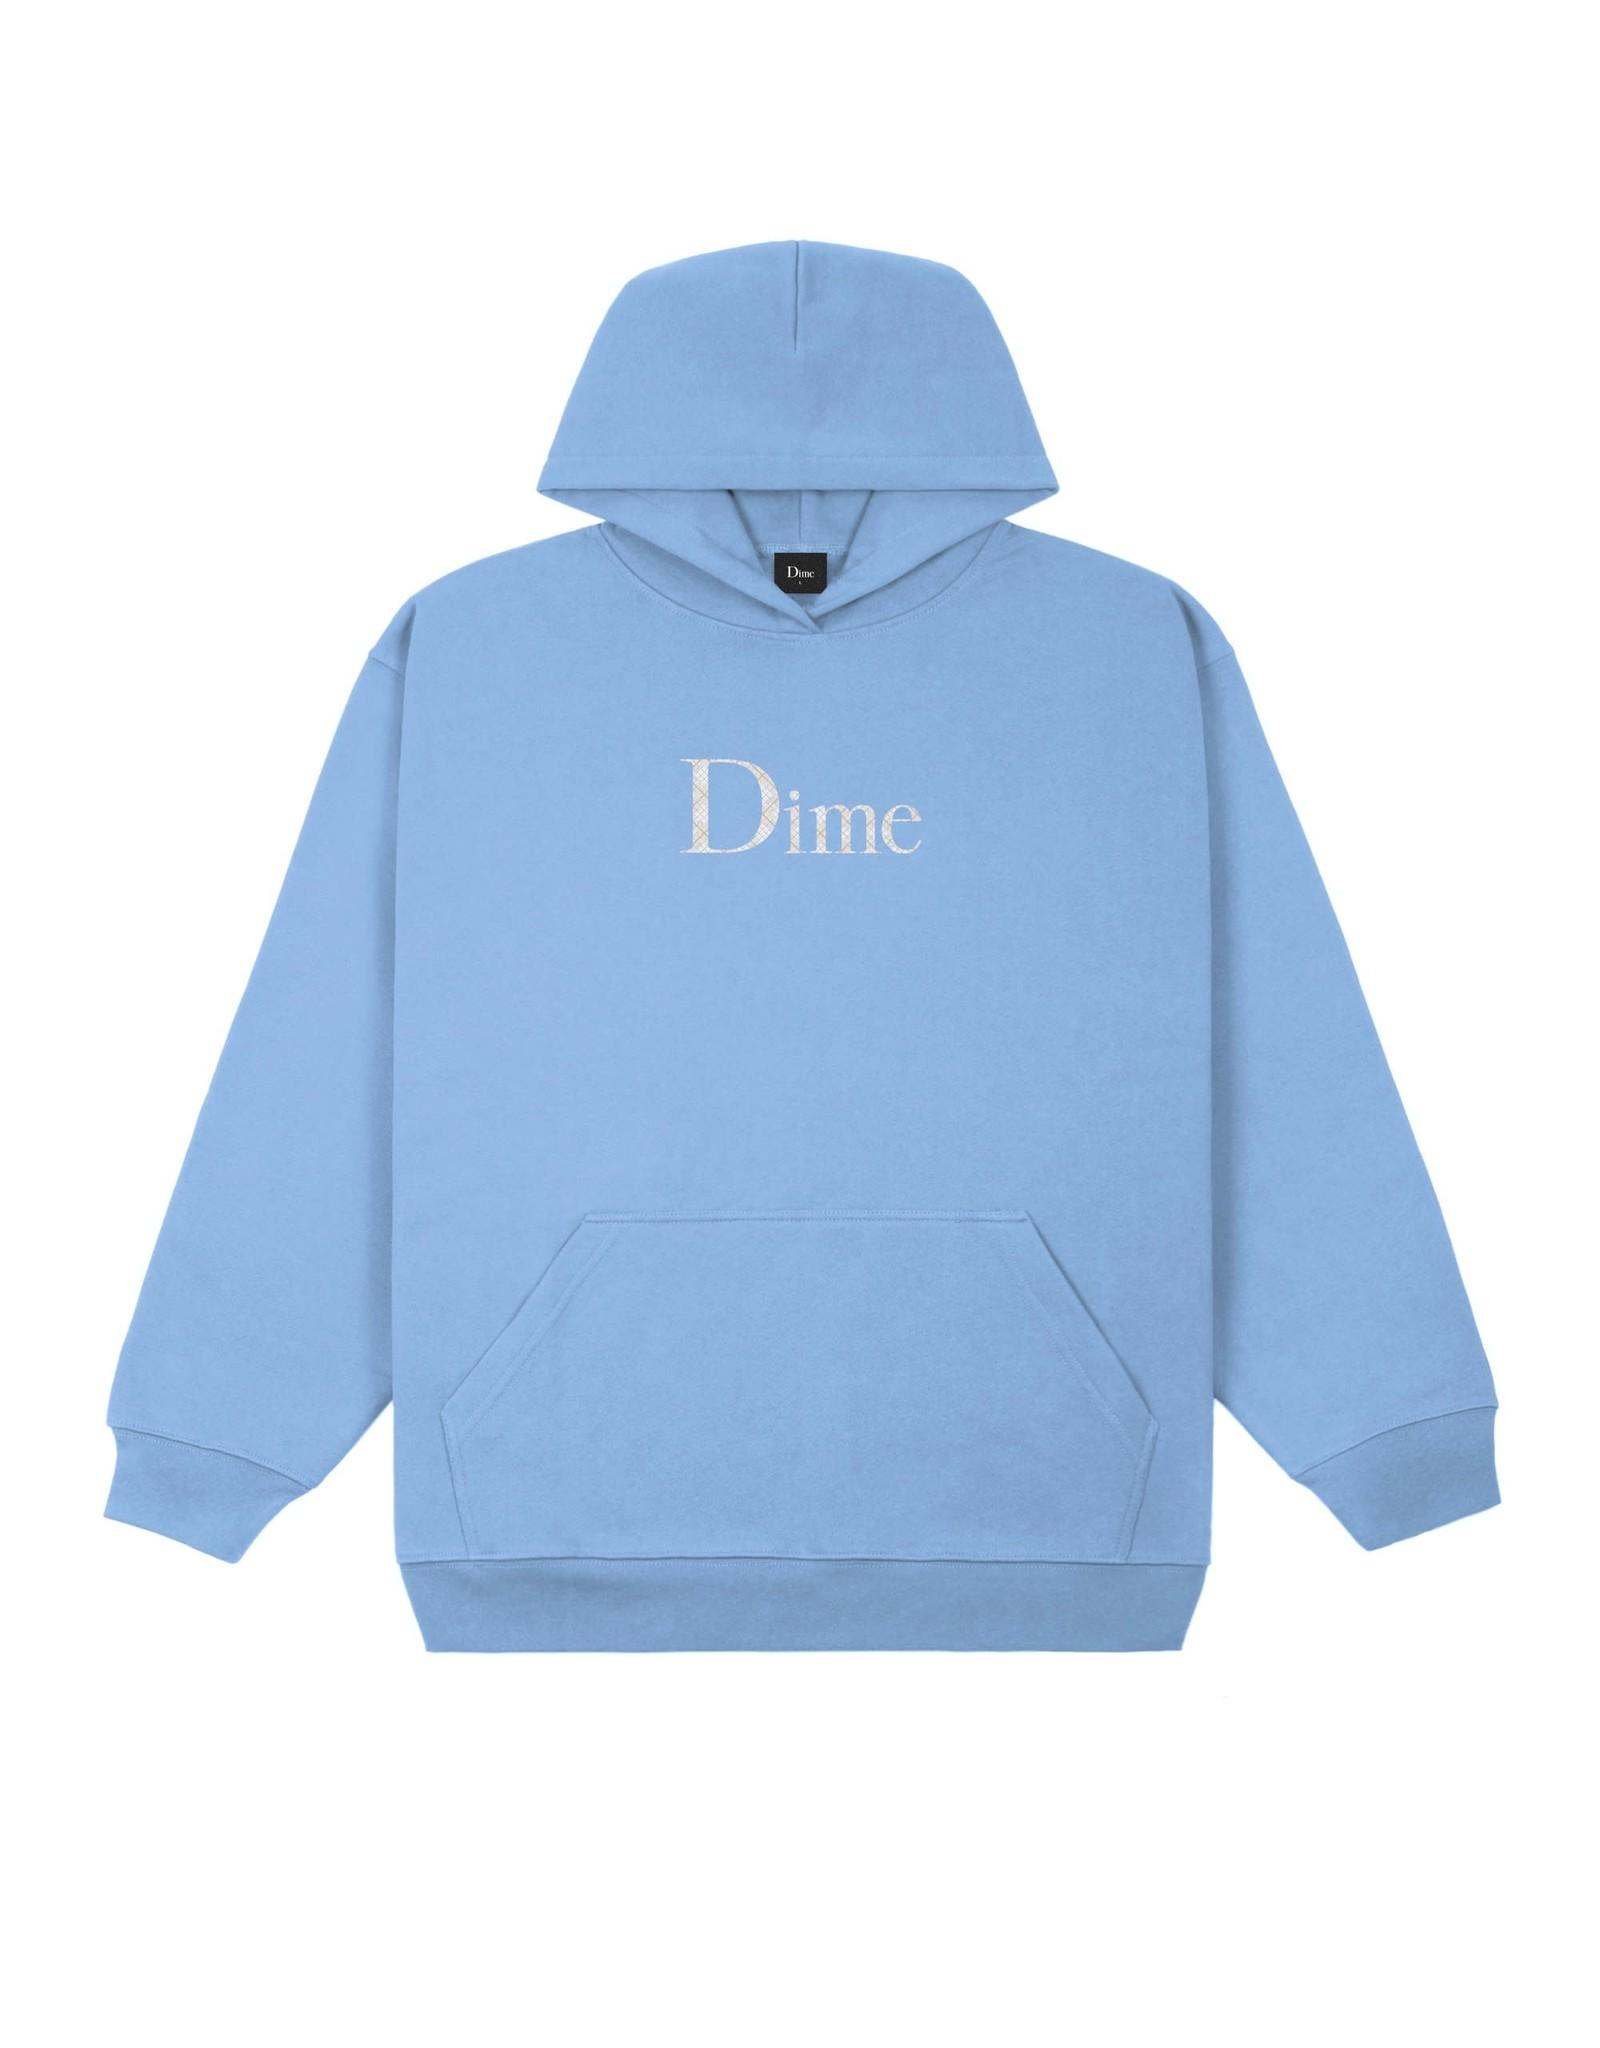 Dime Classic Plaid Hoodie - Carolina Blue